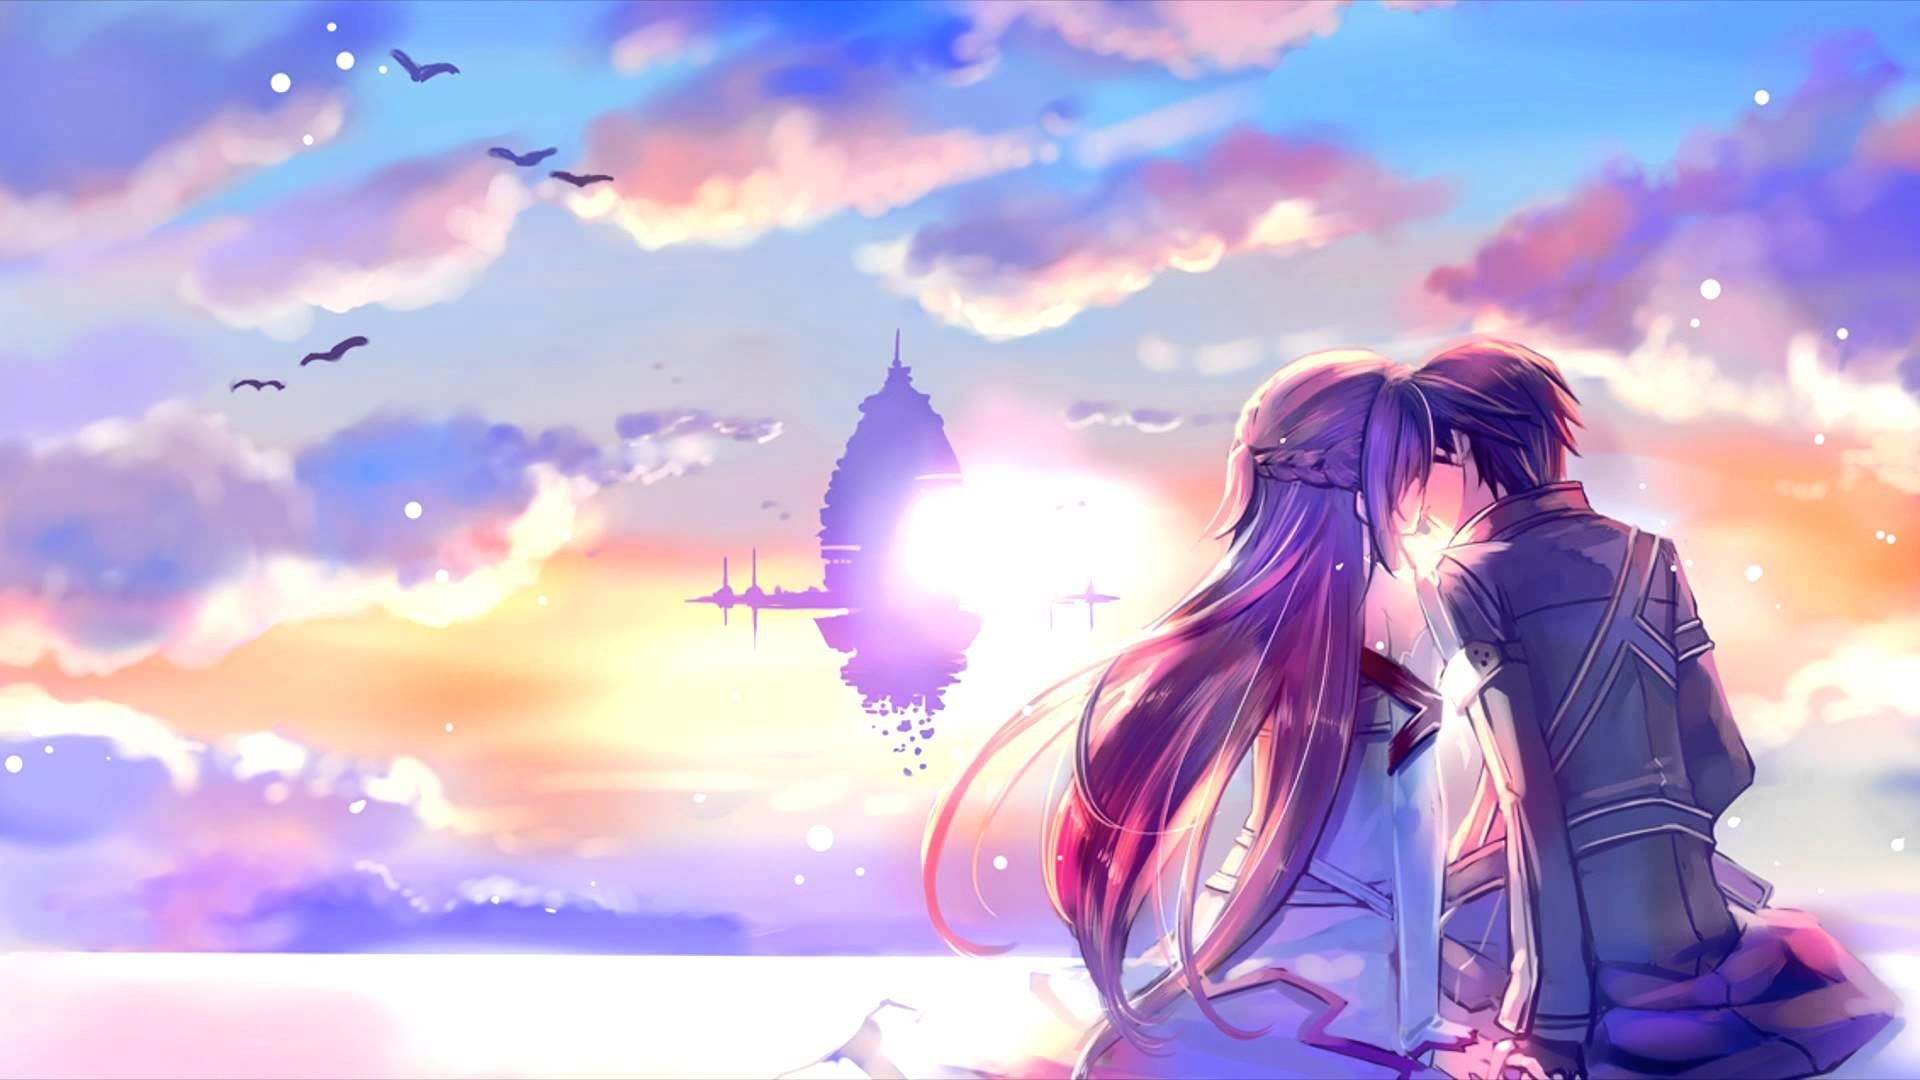 Res: 1920x1080, Romantic Asuna And Kirito Sword Art Online Wallpaper #2815 .